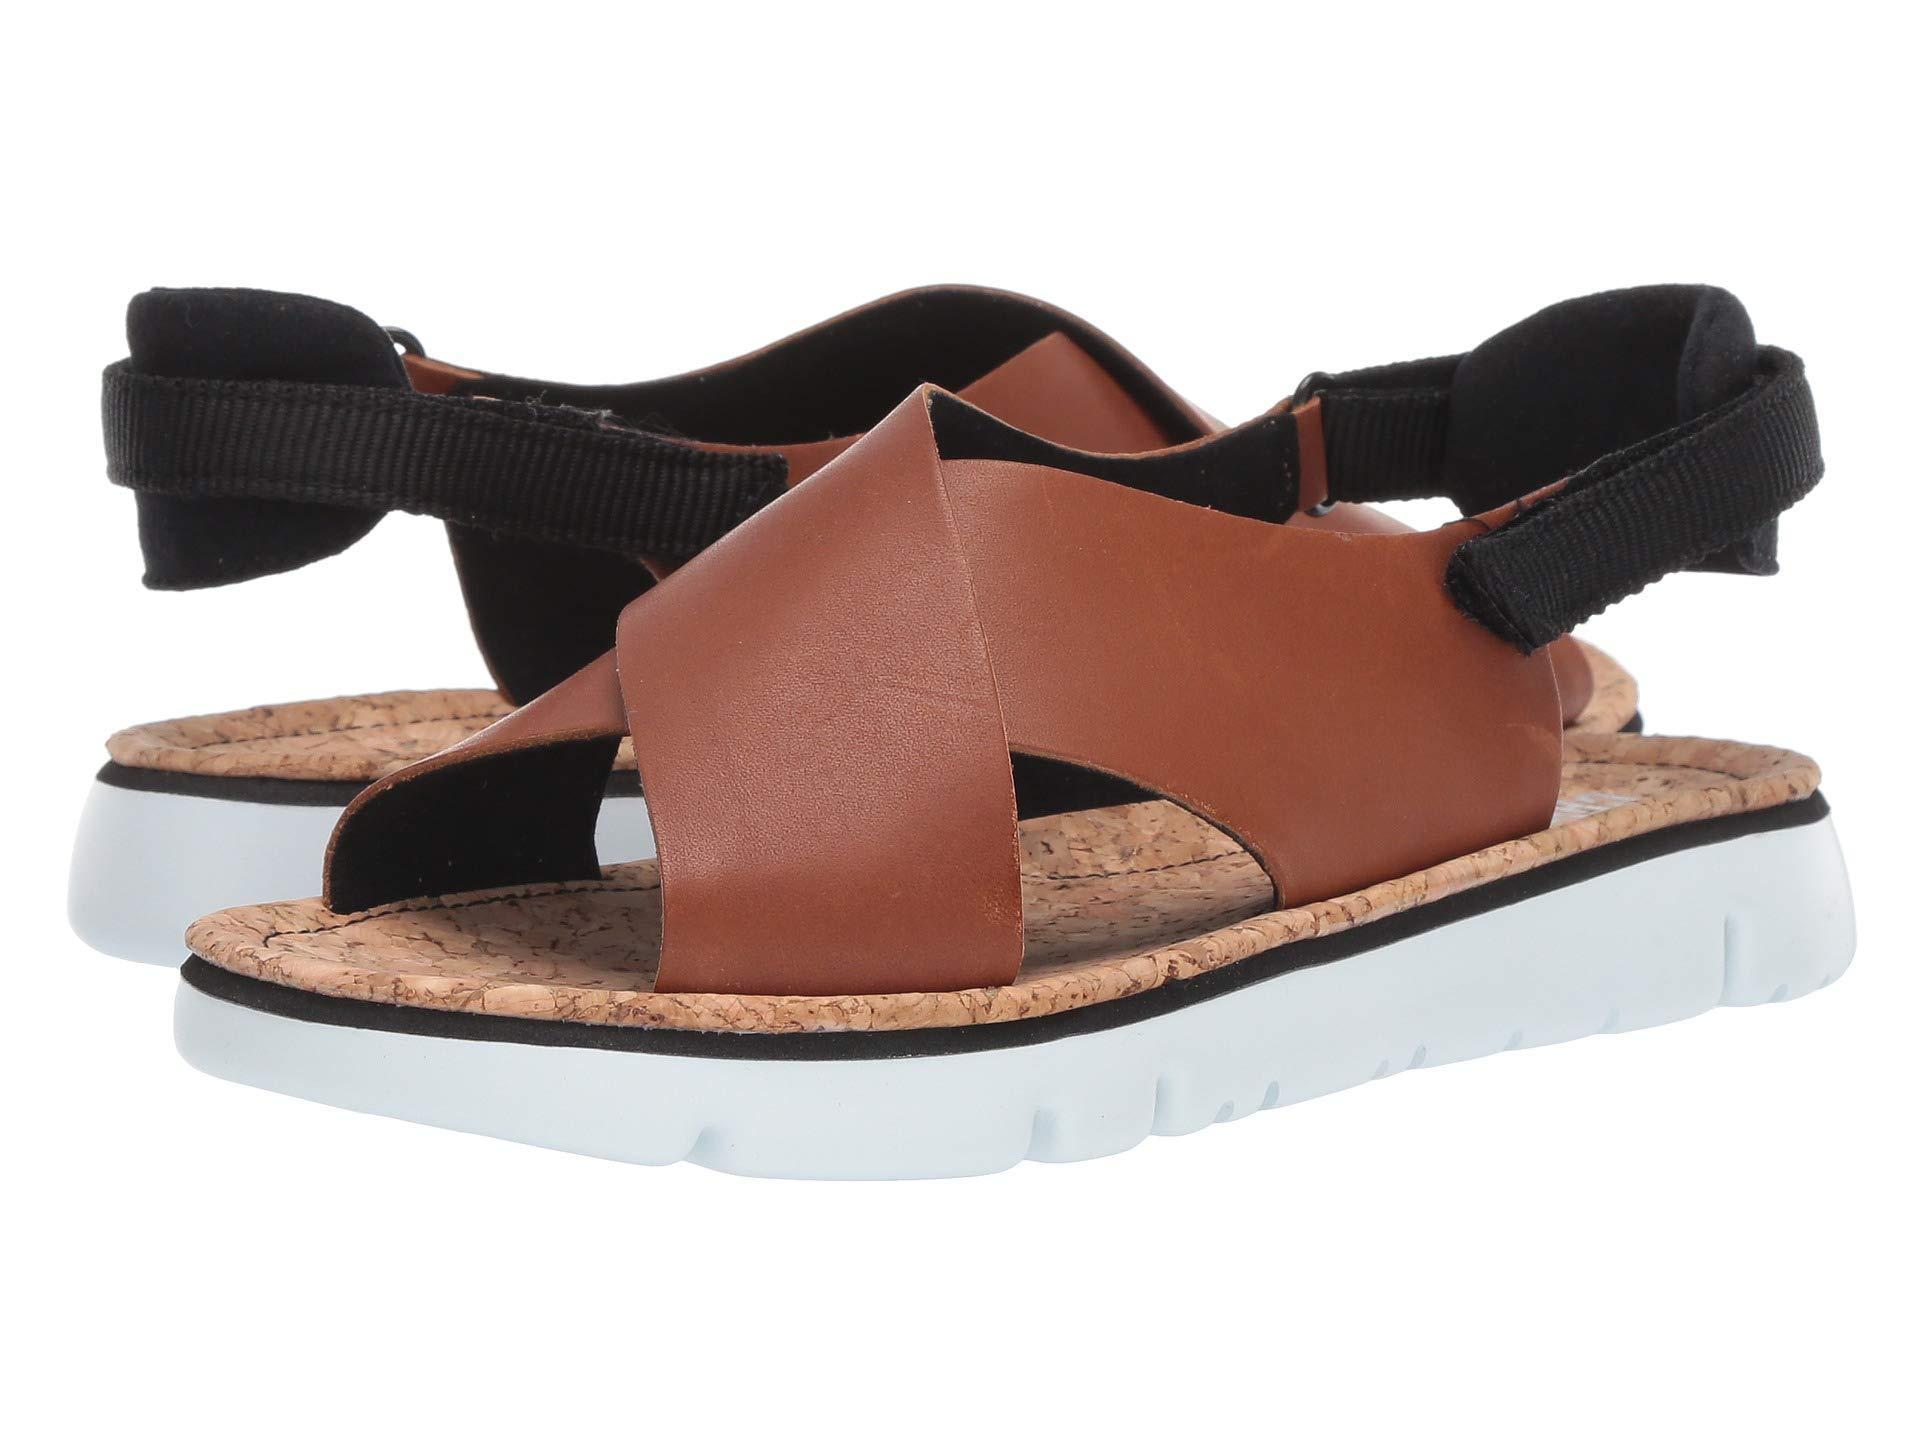 331fb97969cc Lyst - Camper Oruga - K200157 (medium Red) Women s Sandals